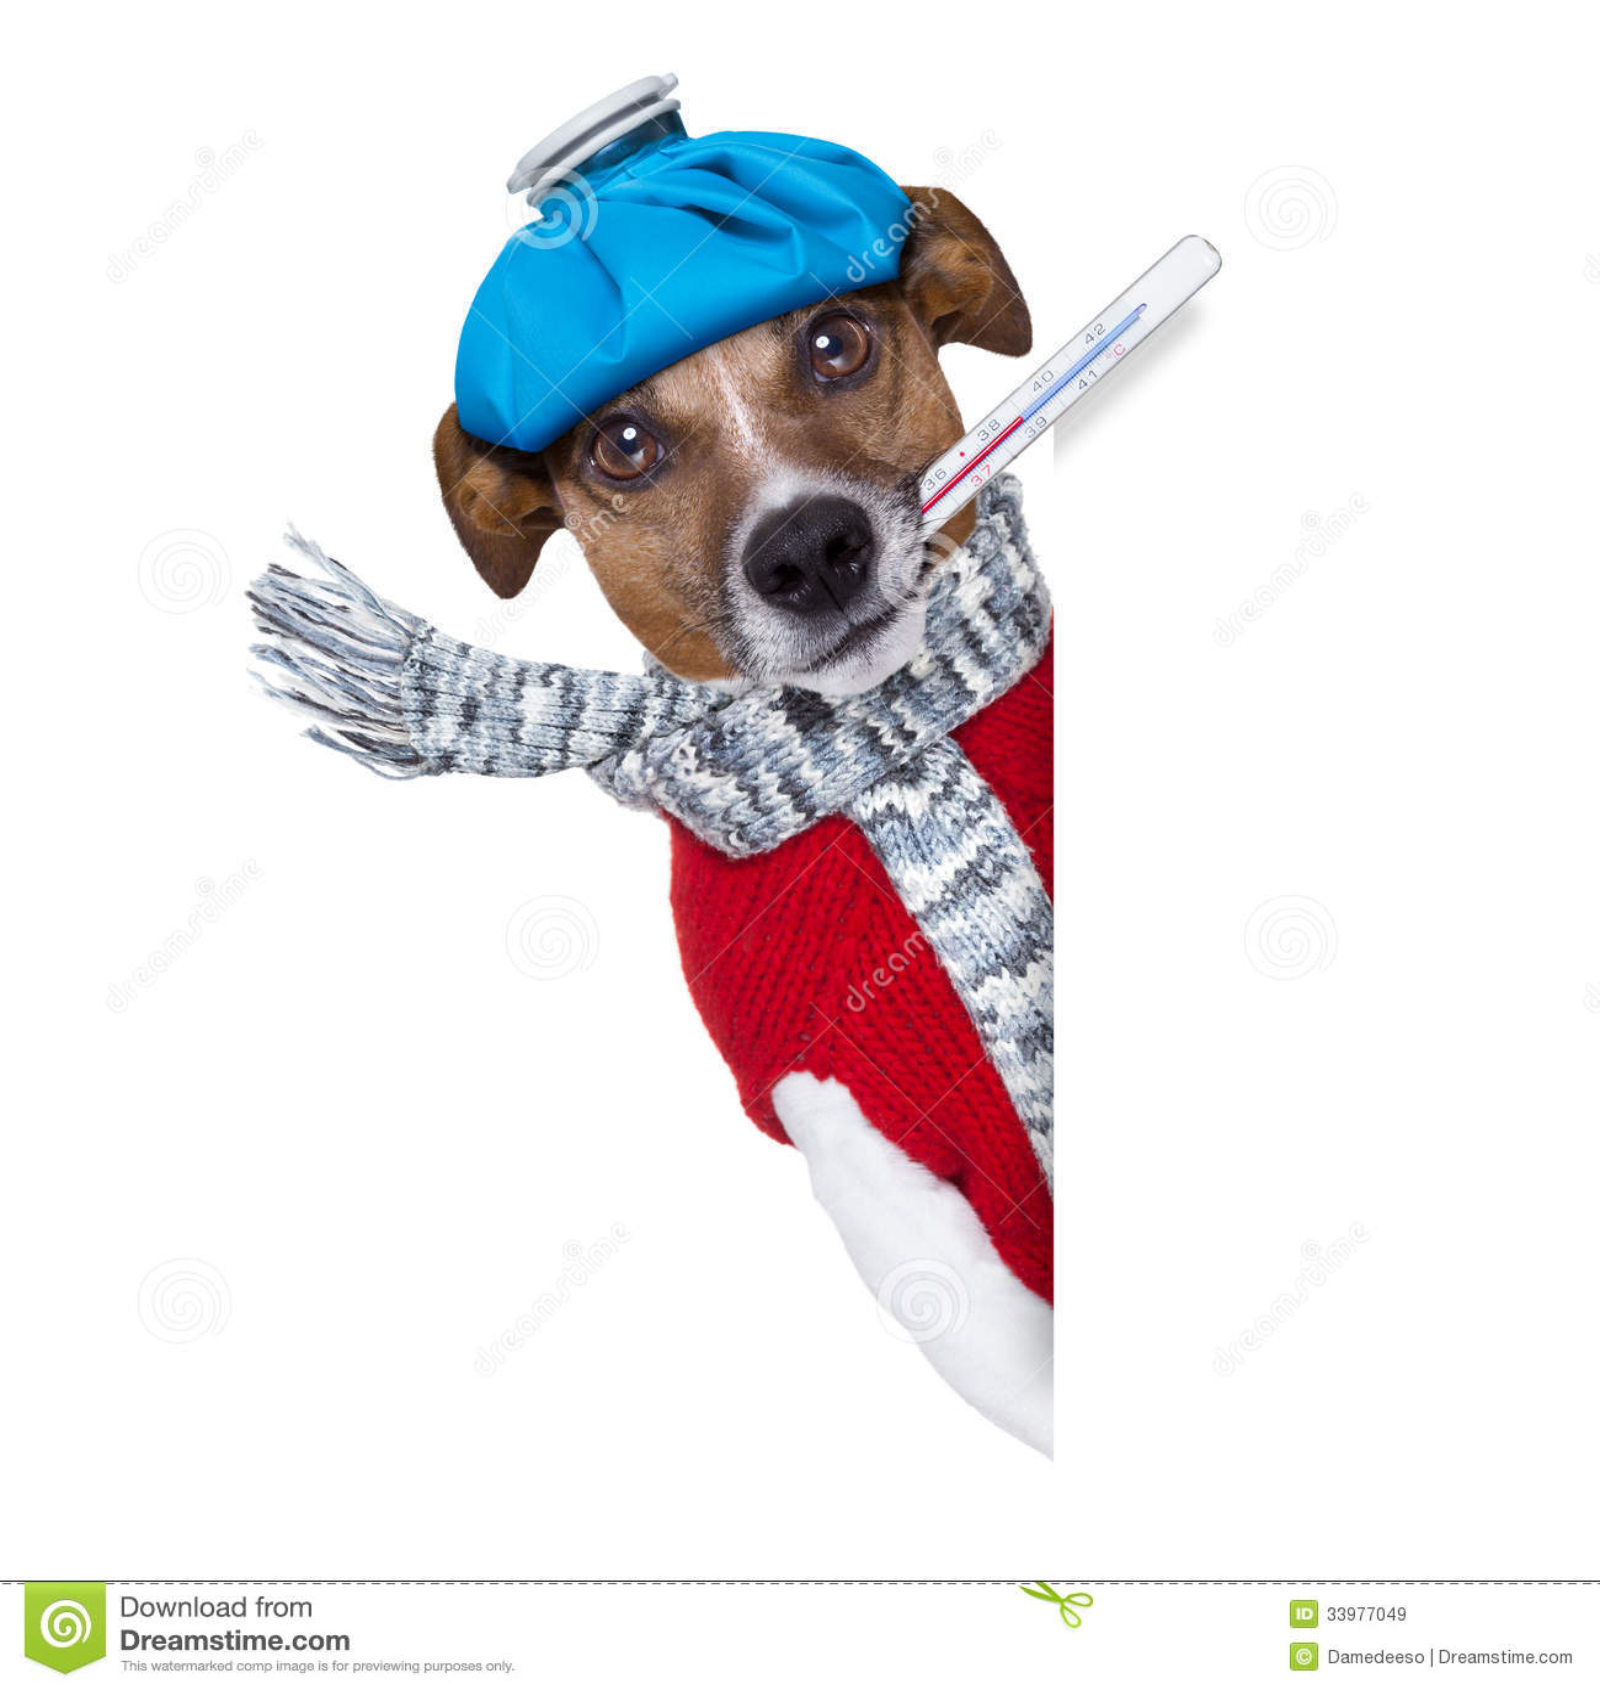 kranker hund mit fieber stockbild bild von beutel lustig 33977049. Black Bedroom Furniture Sets. Home Design Ideas